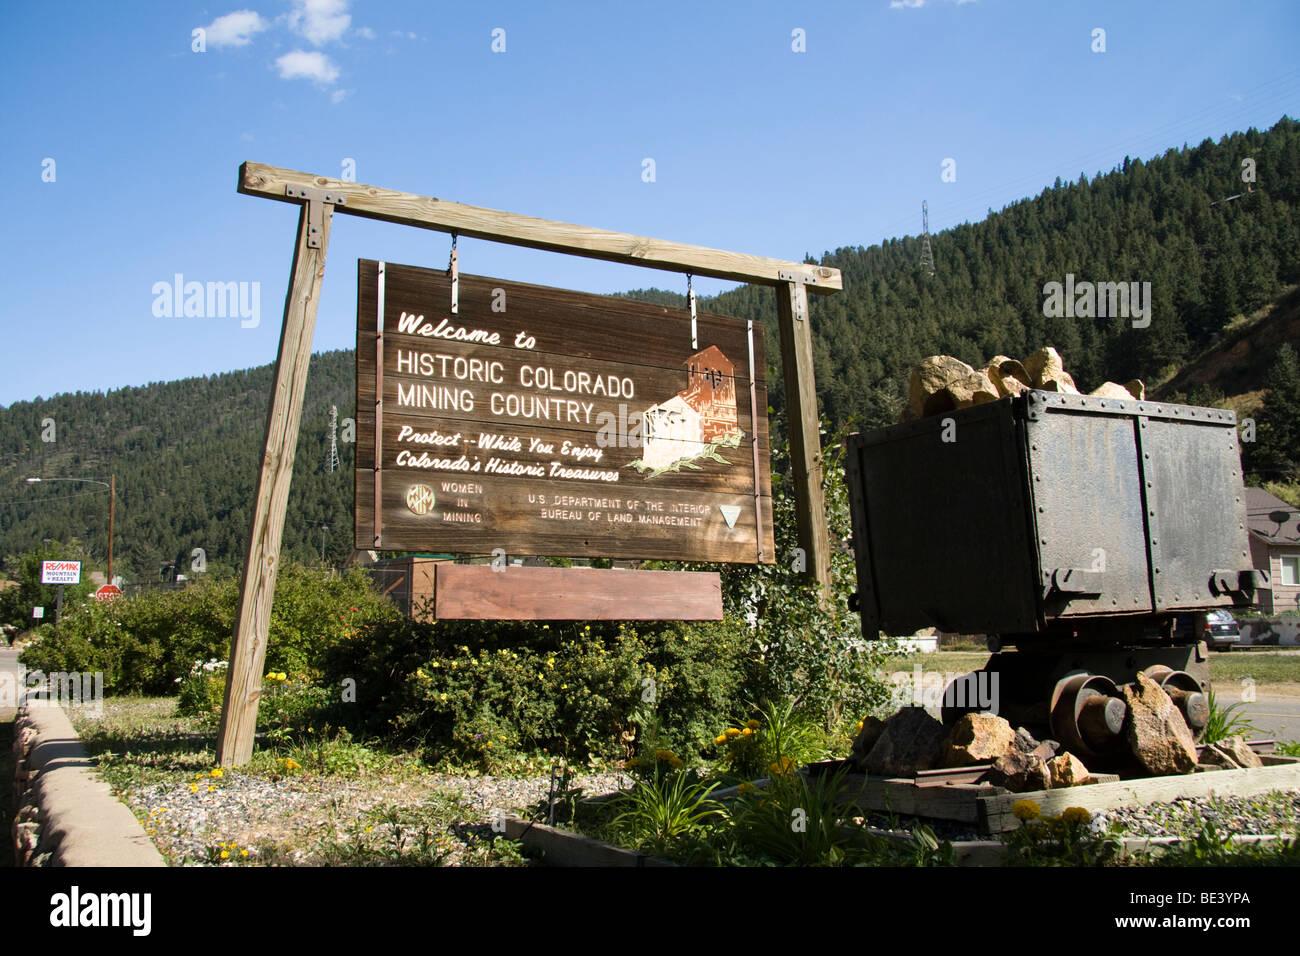 Historic Colorado Mining Country sign, Colorado, USA - Stock Image